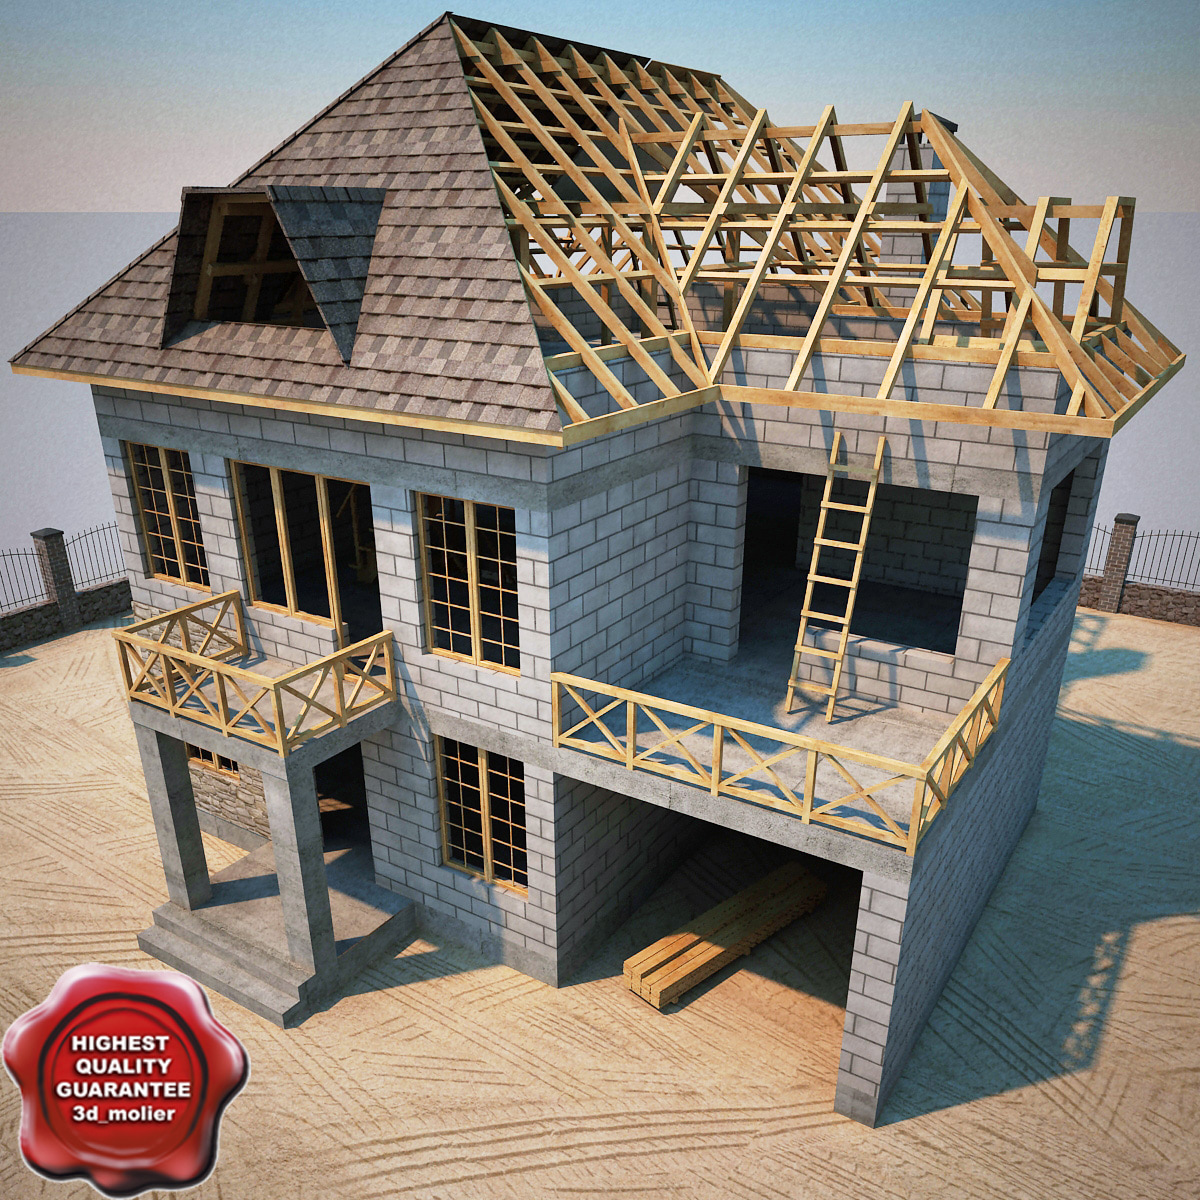 House_Construction_00.jpg